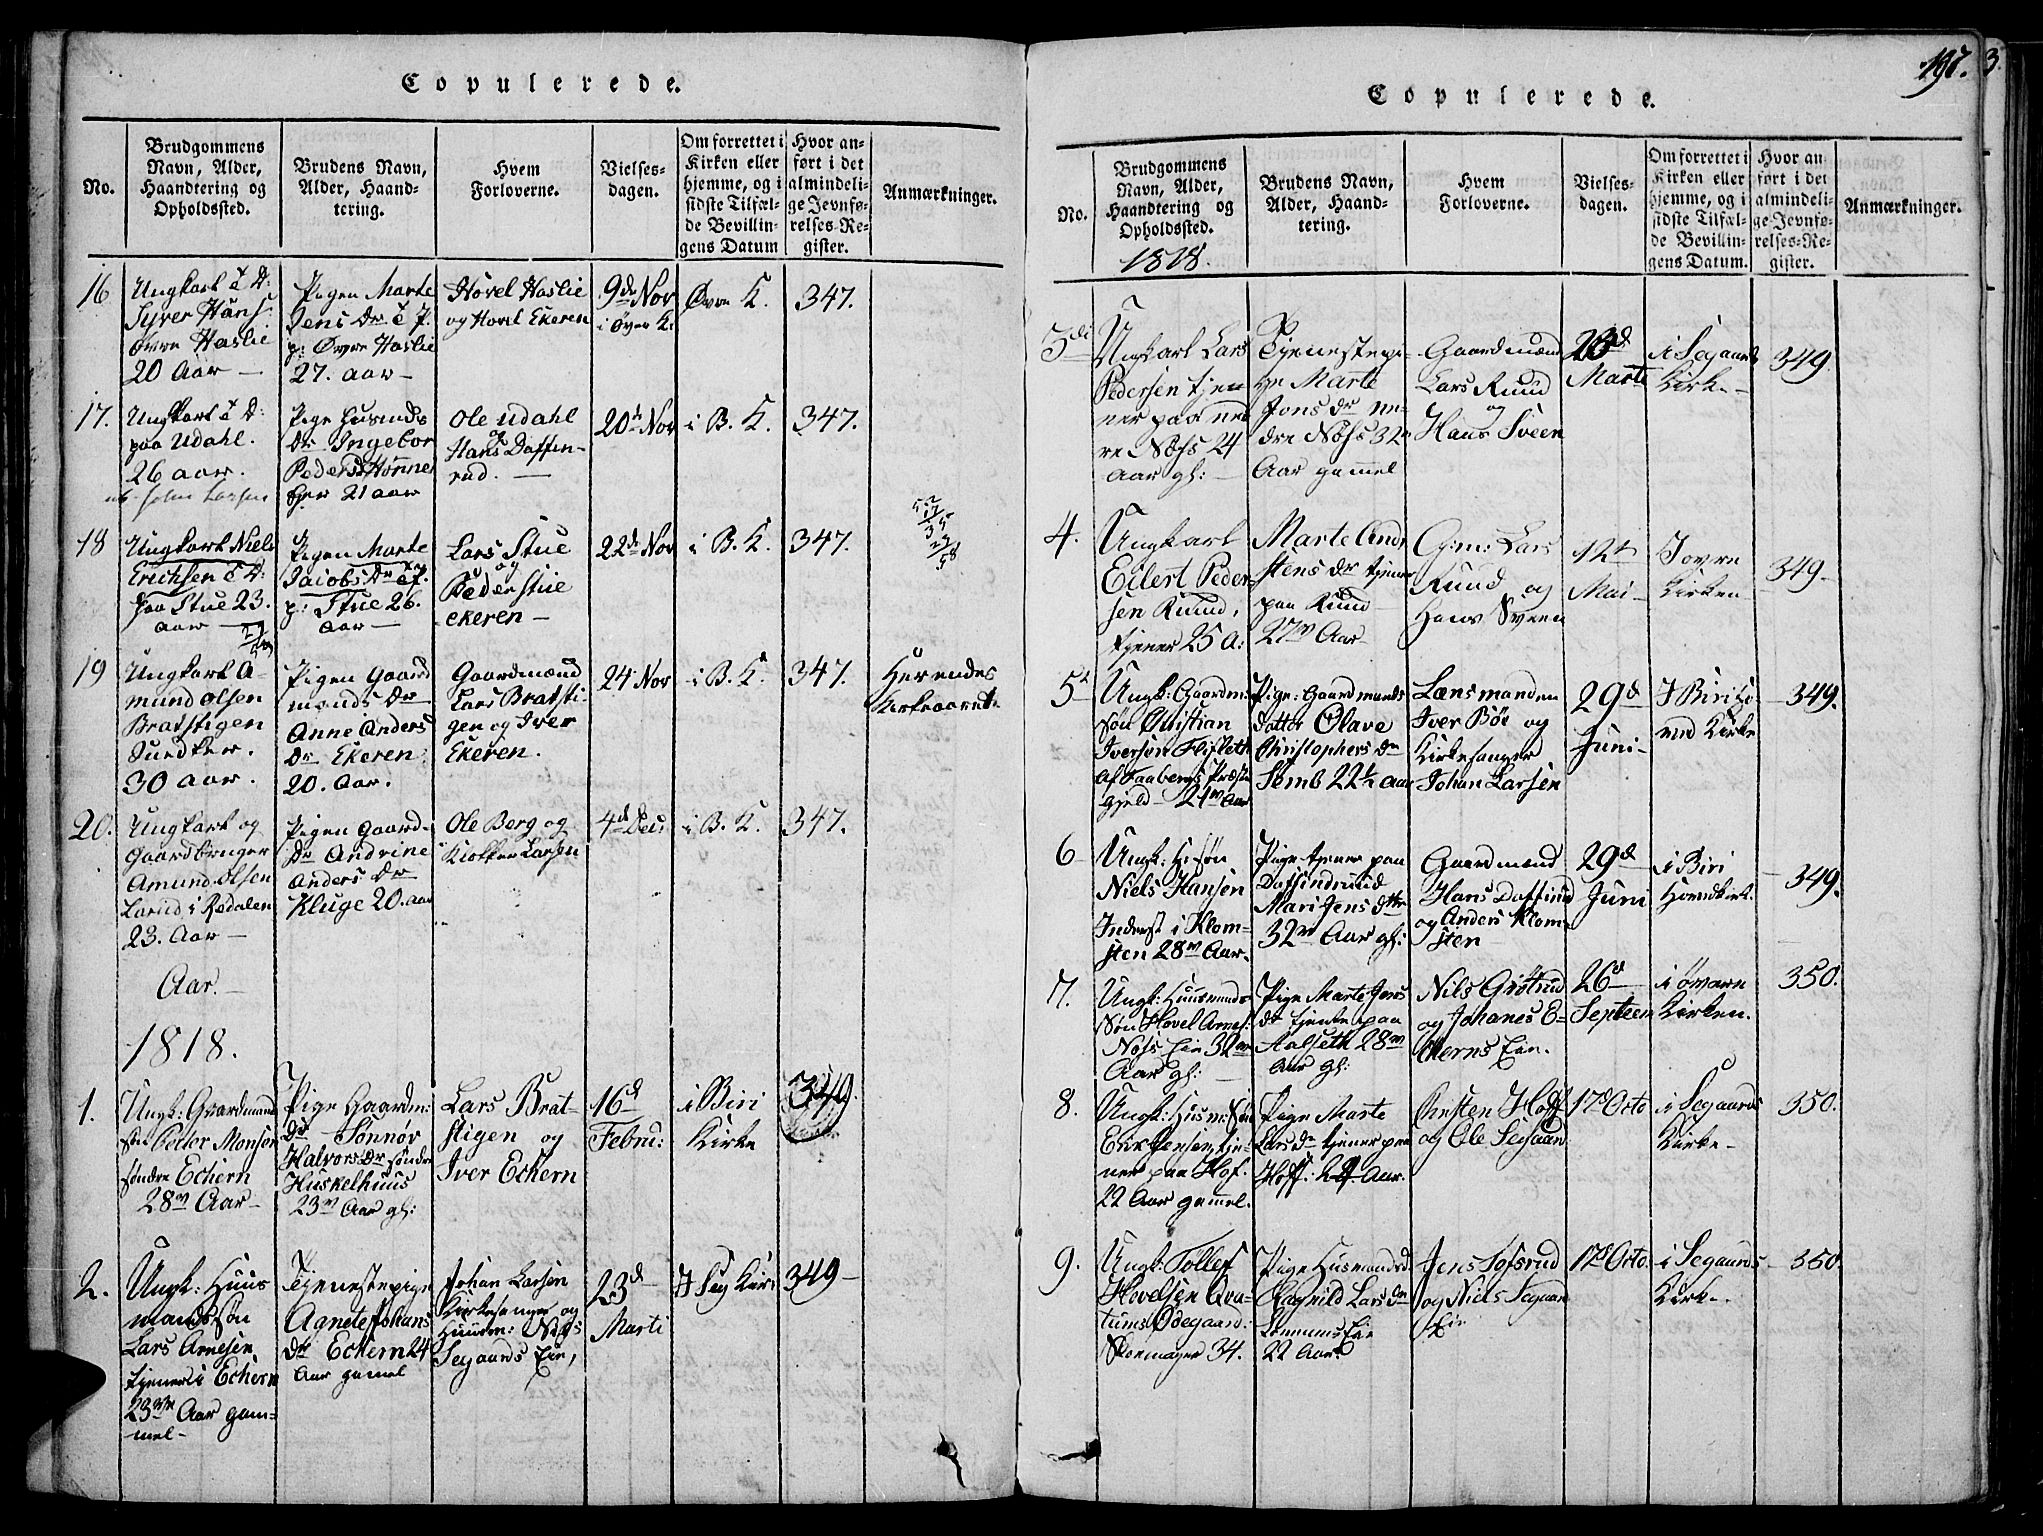 SAH, Biri prestekontor, Ministerialbok nr. 3, 1814-1828, s. 197